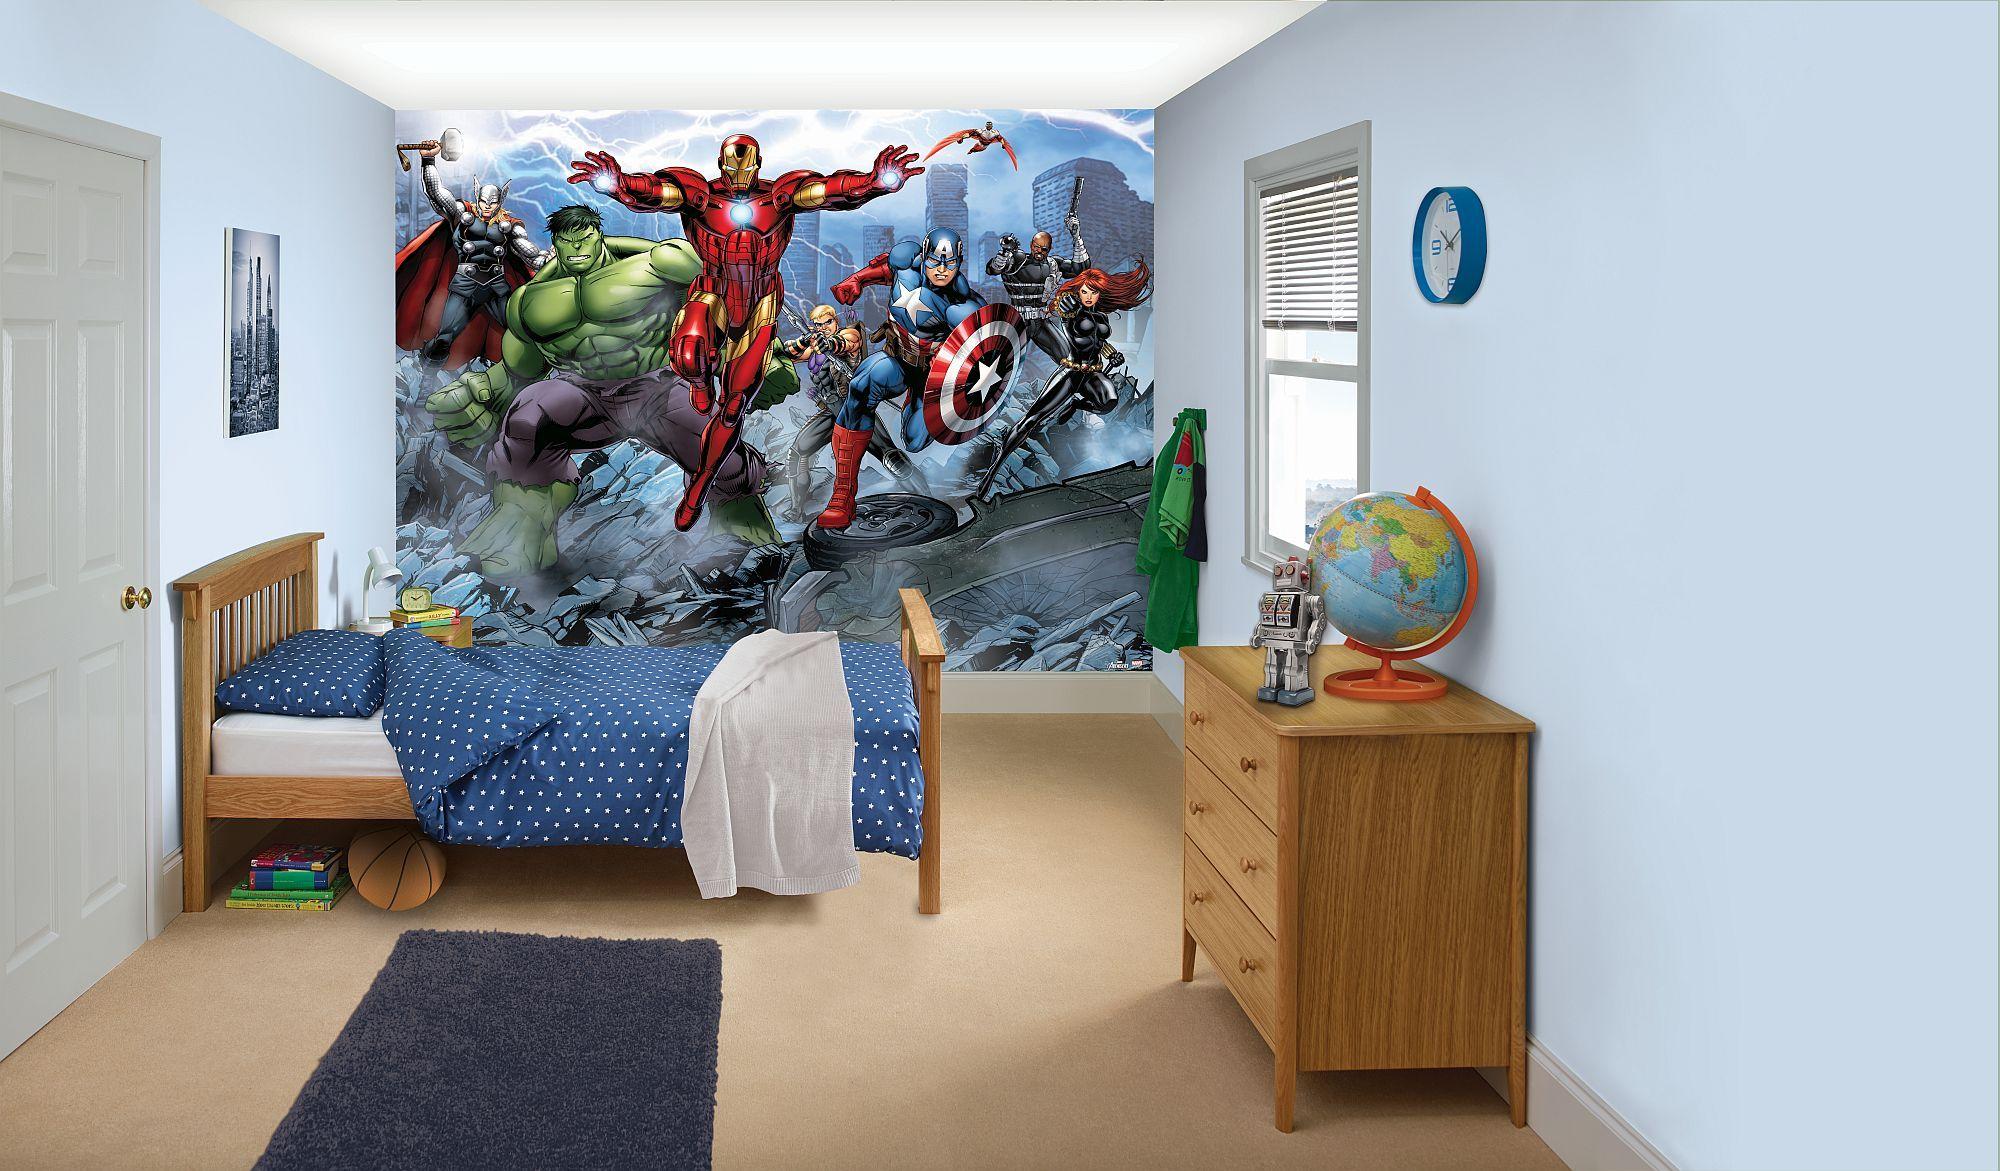 Marvel Avengers Bedroom Wallpaper | Digitalstudiosweb.com